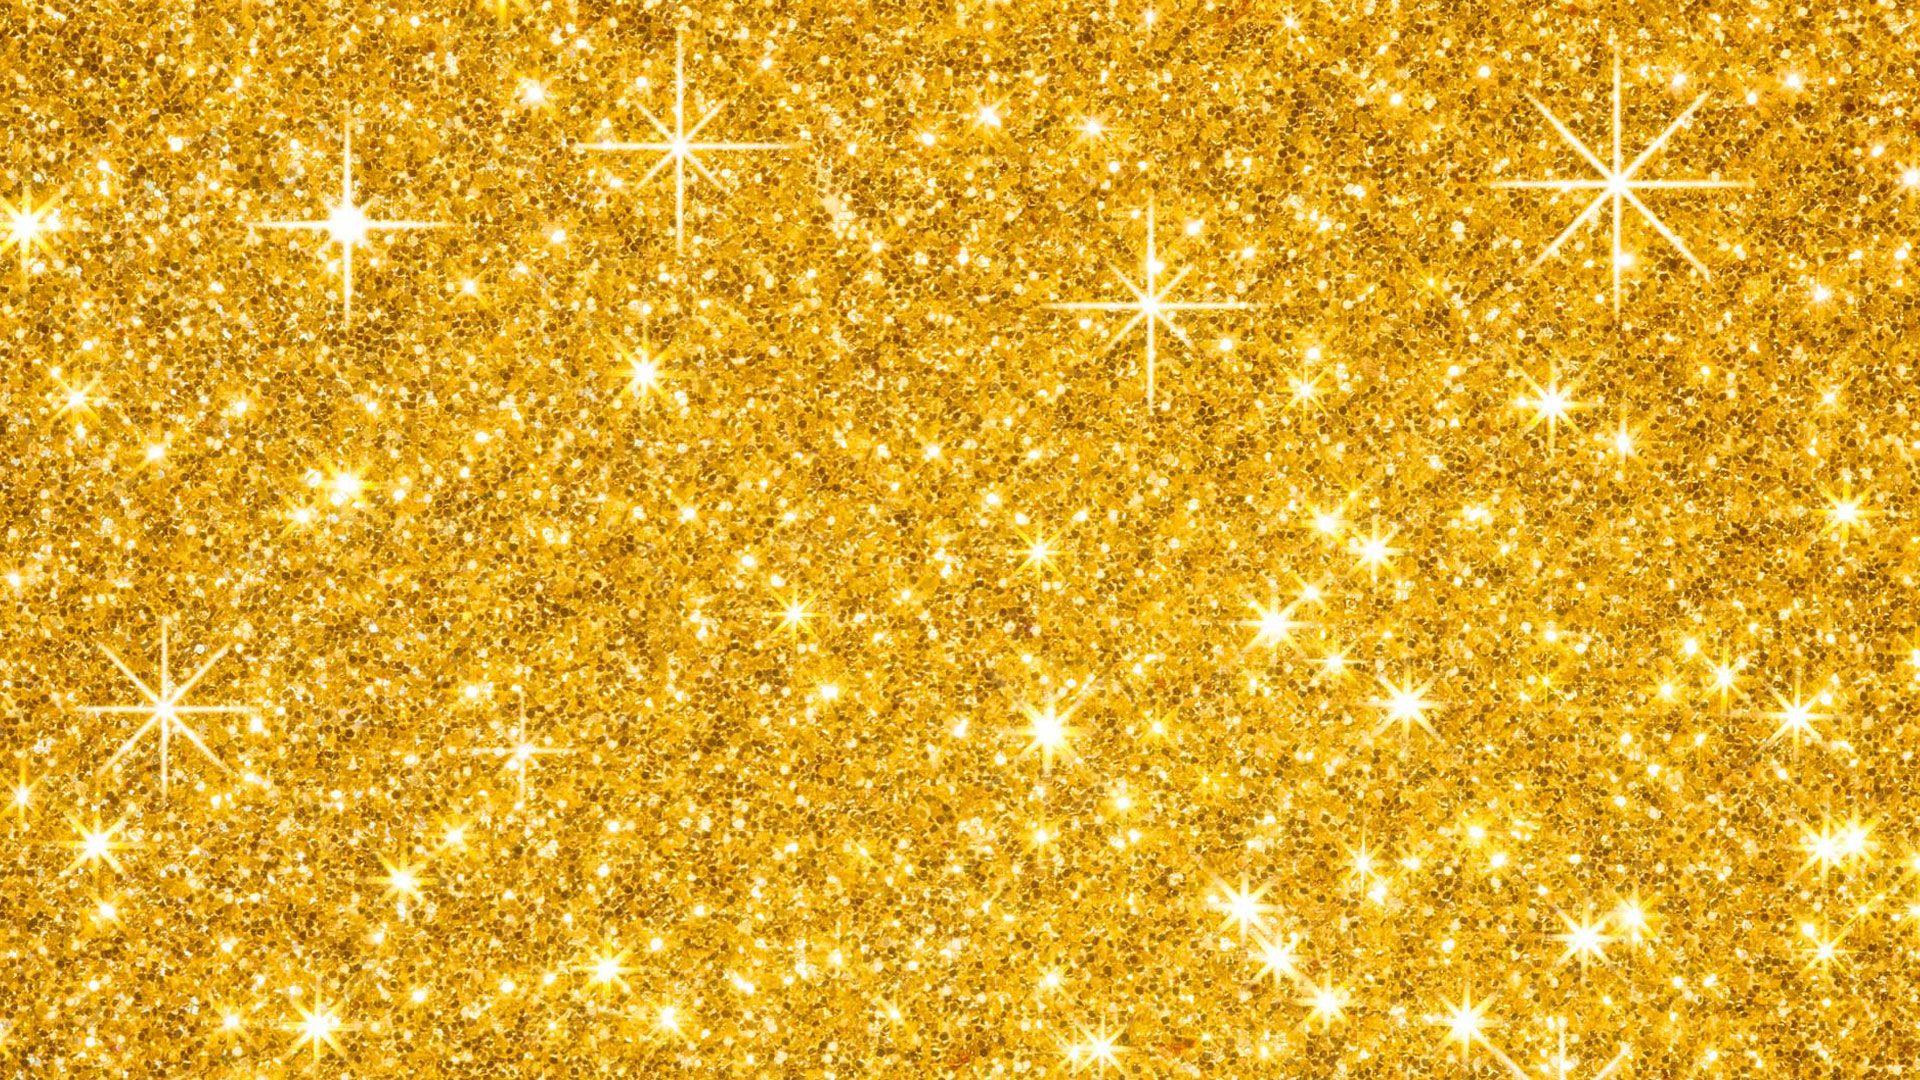 golden background image